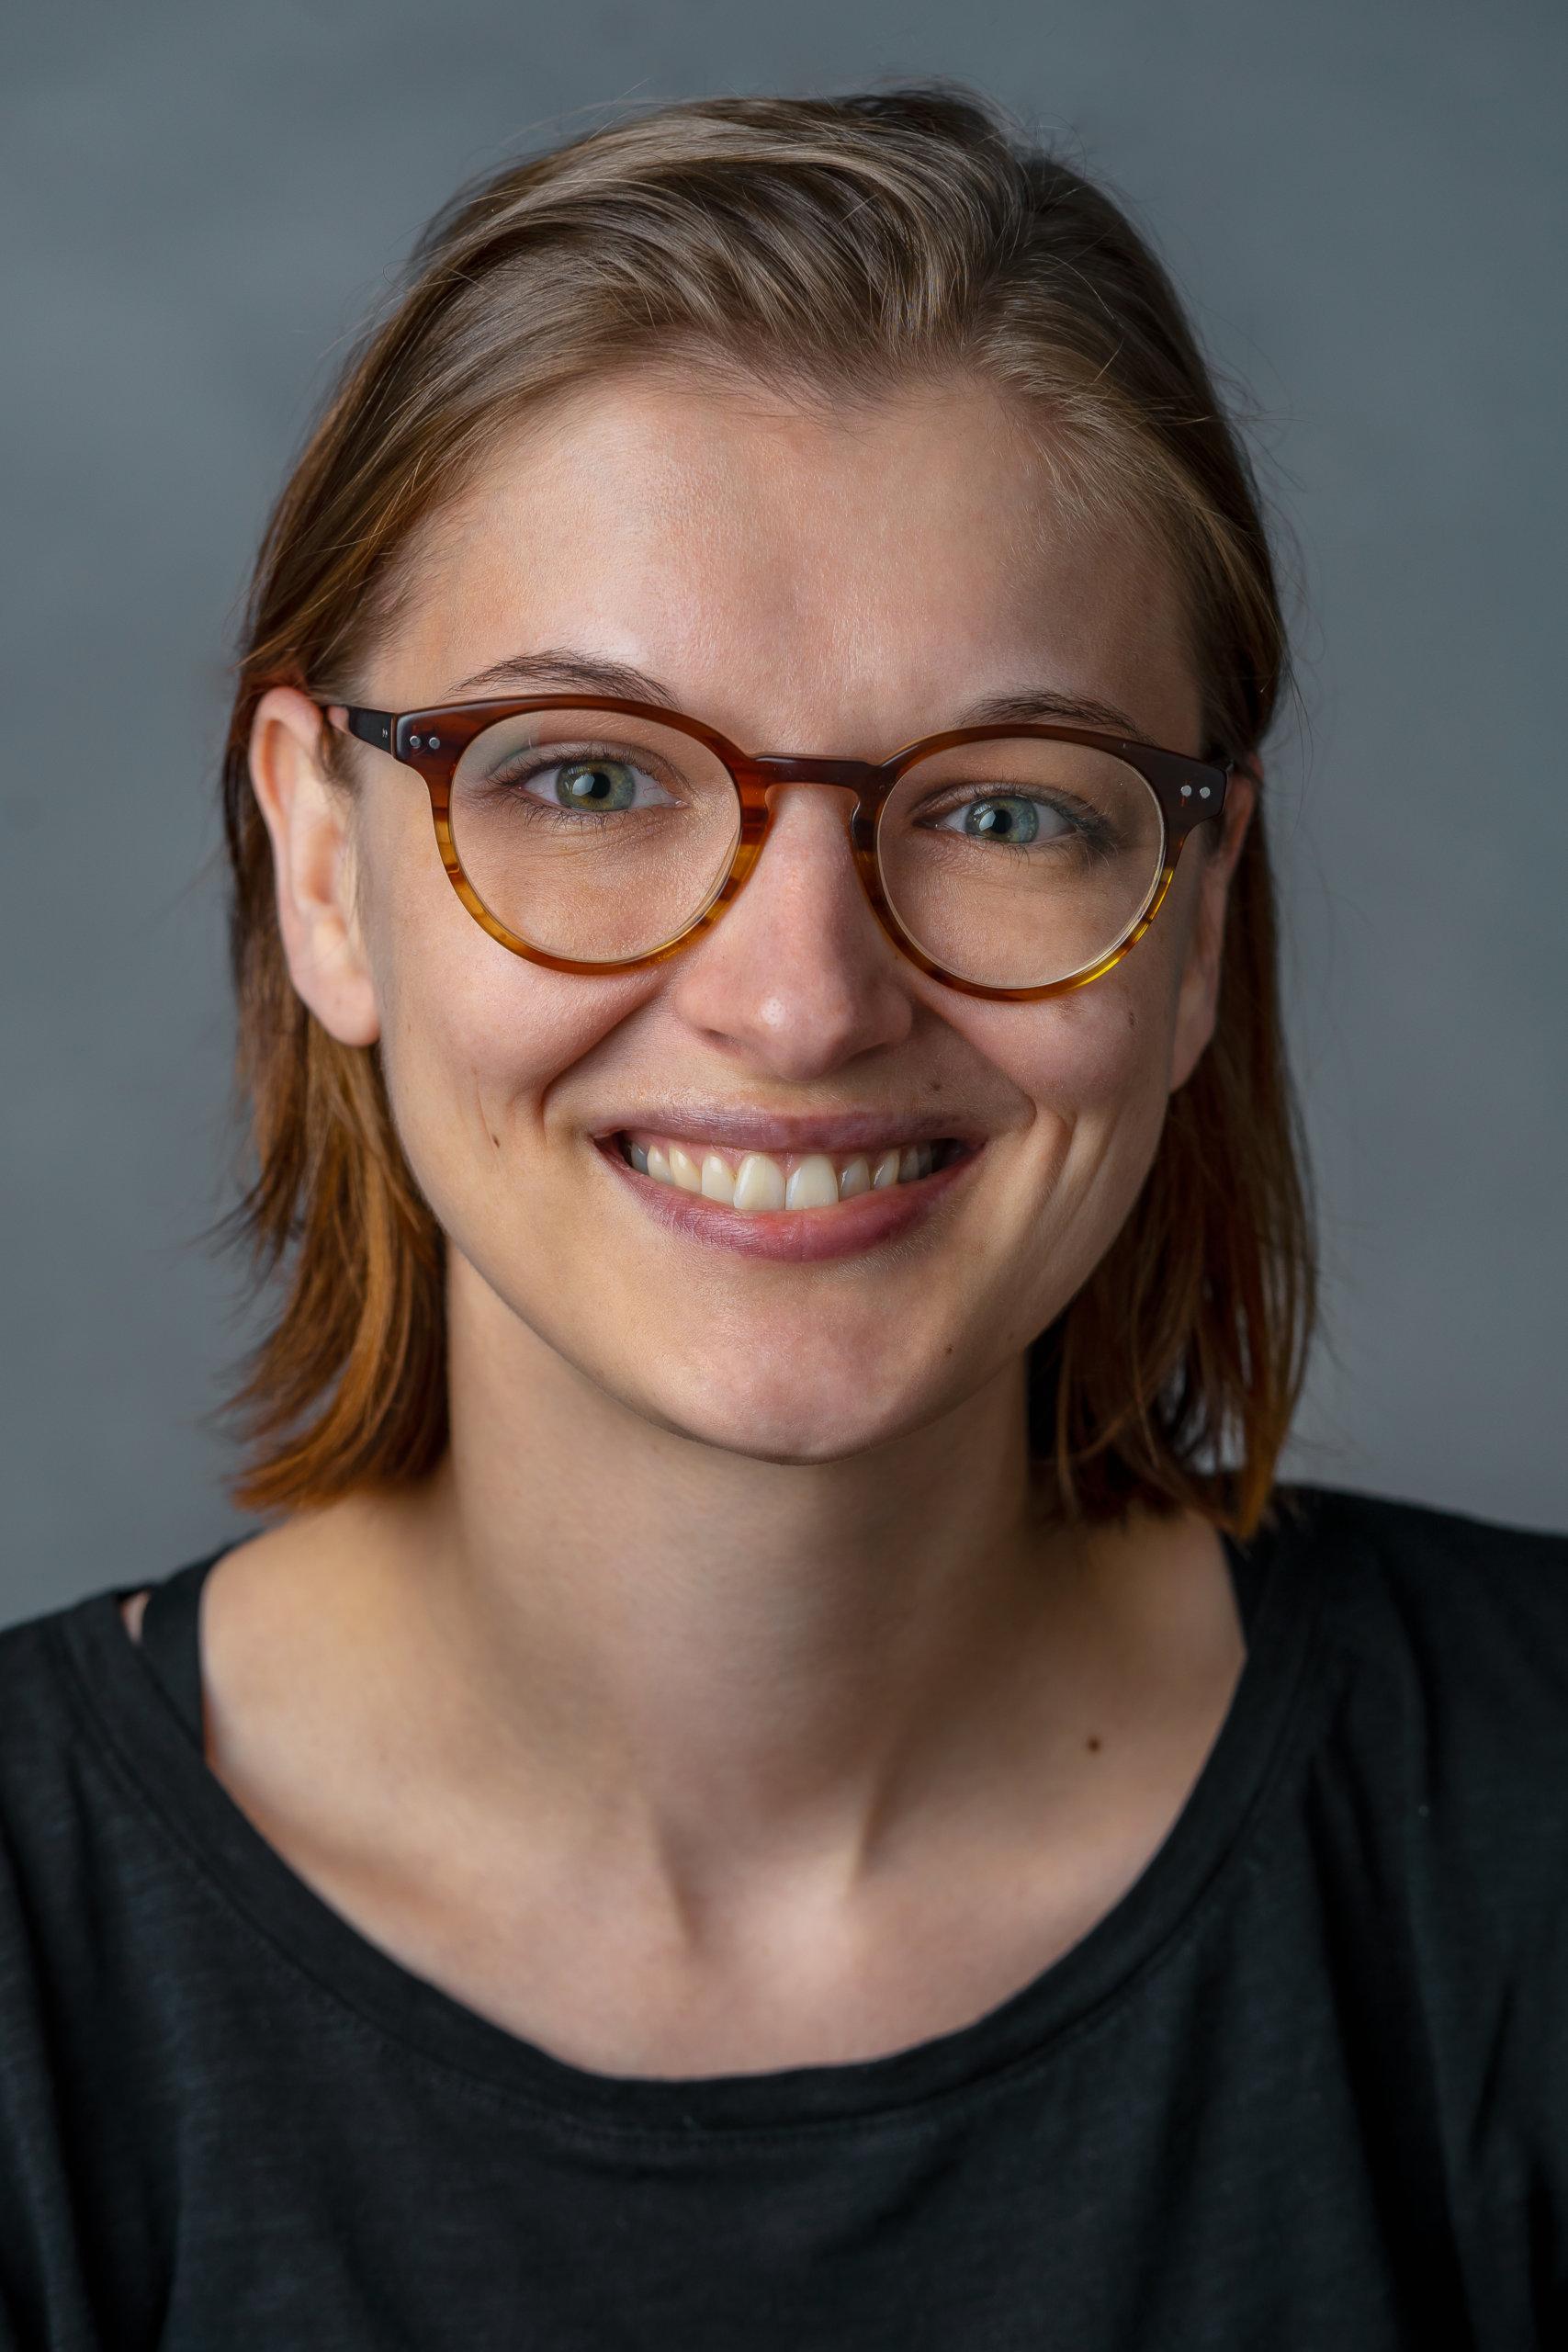 Julia Baschinger